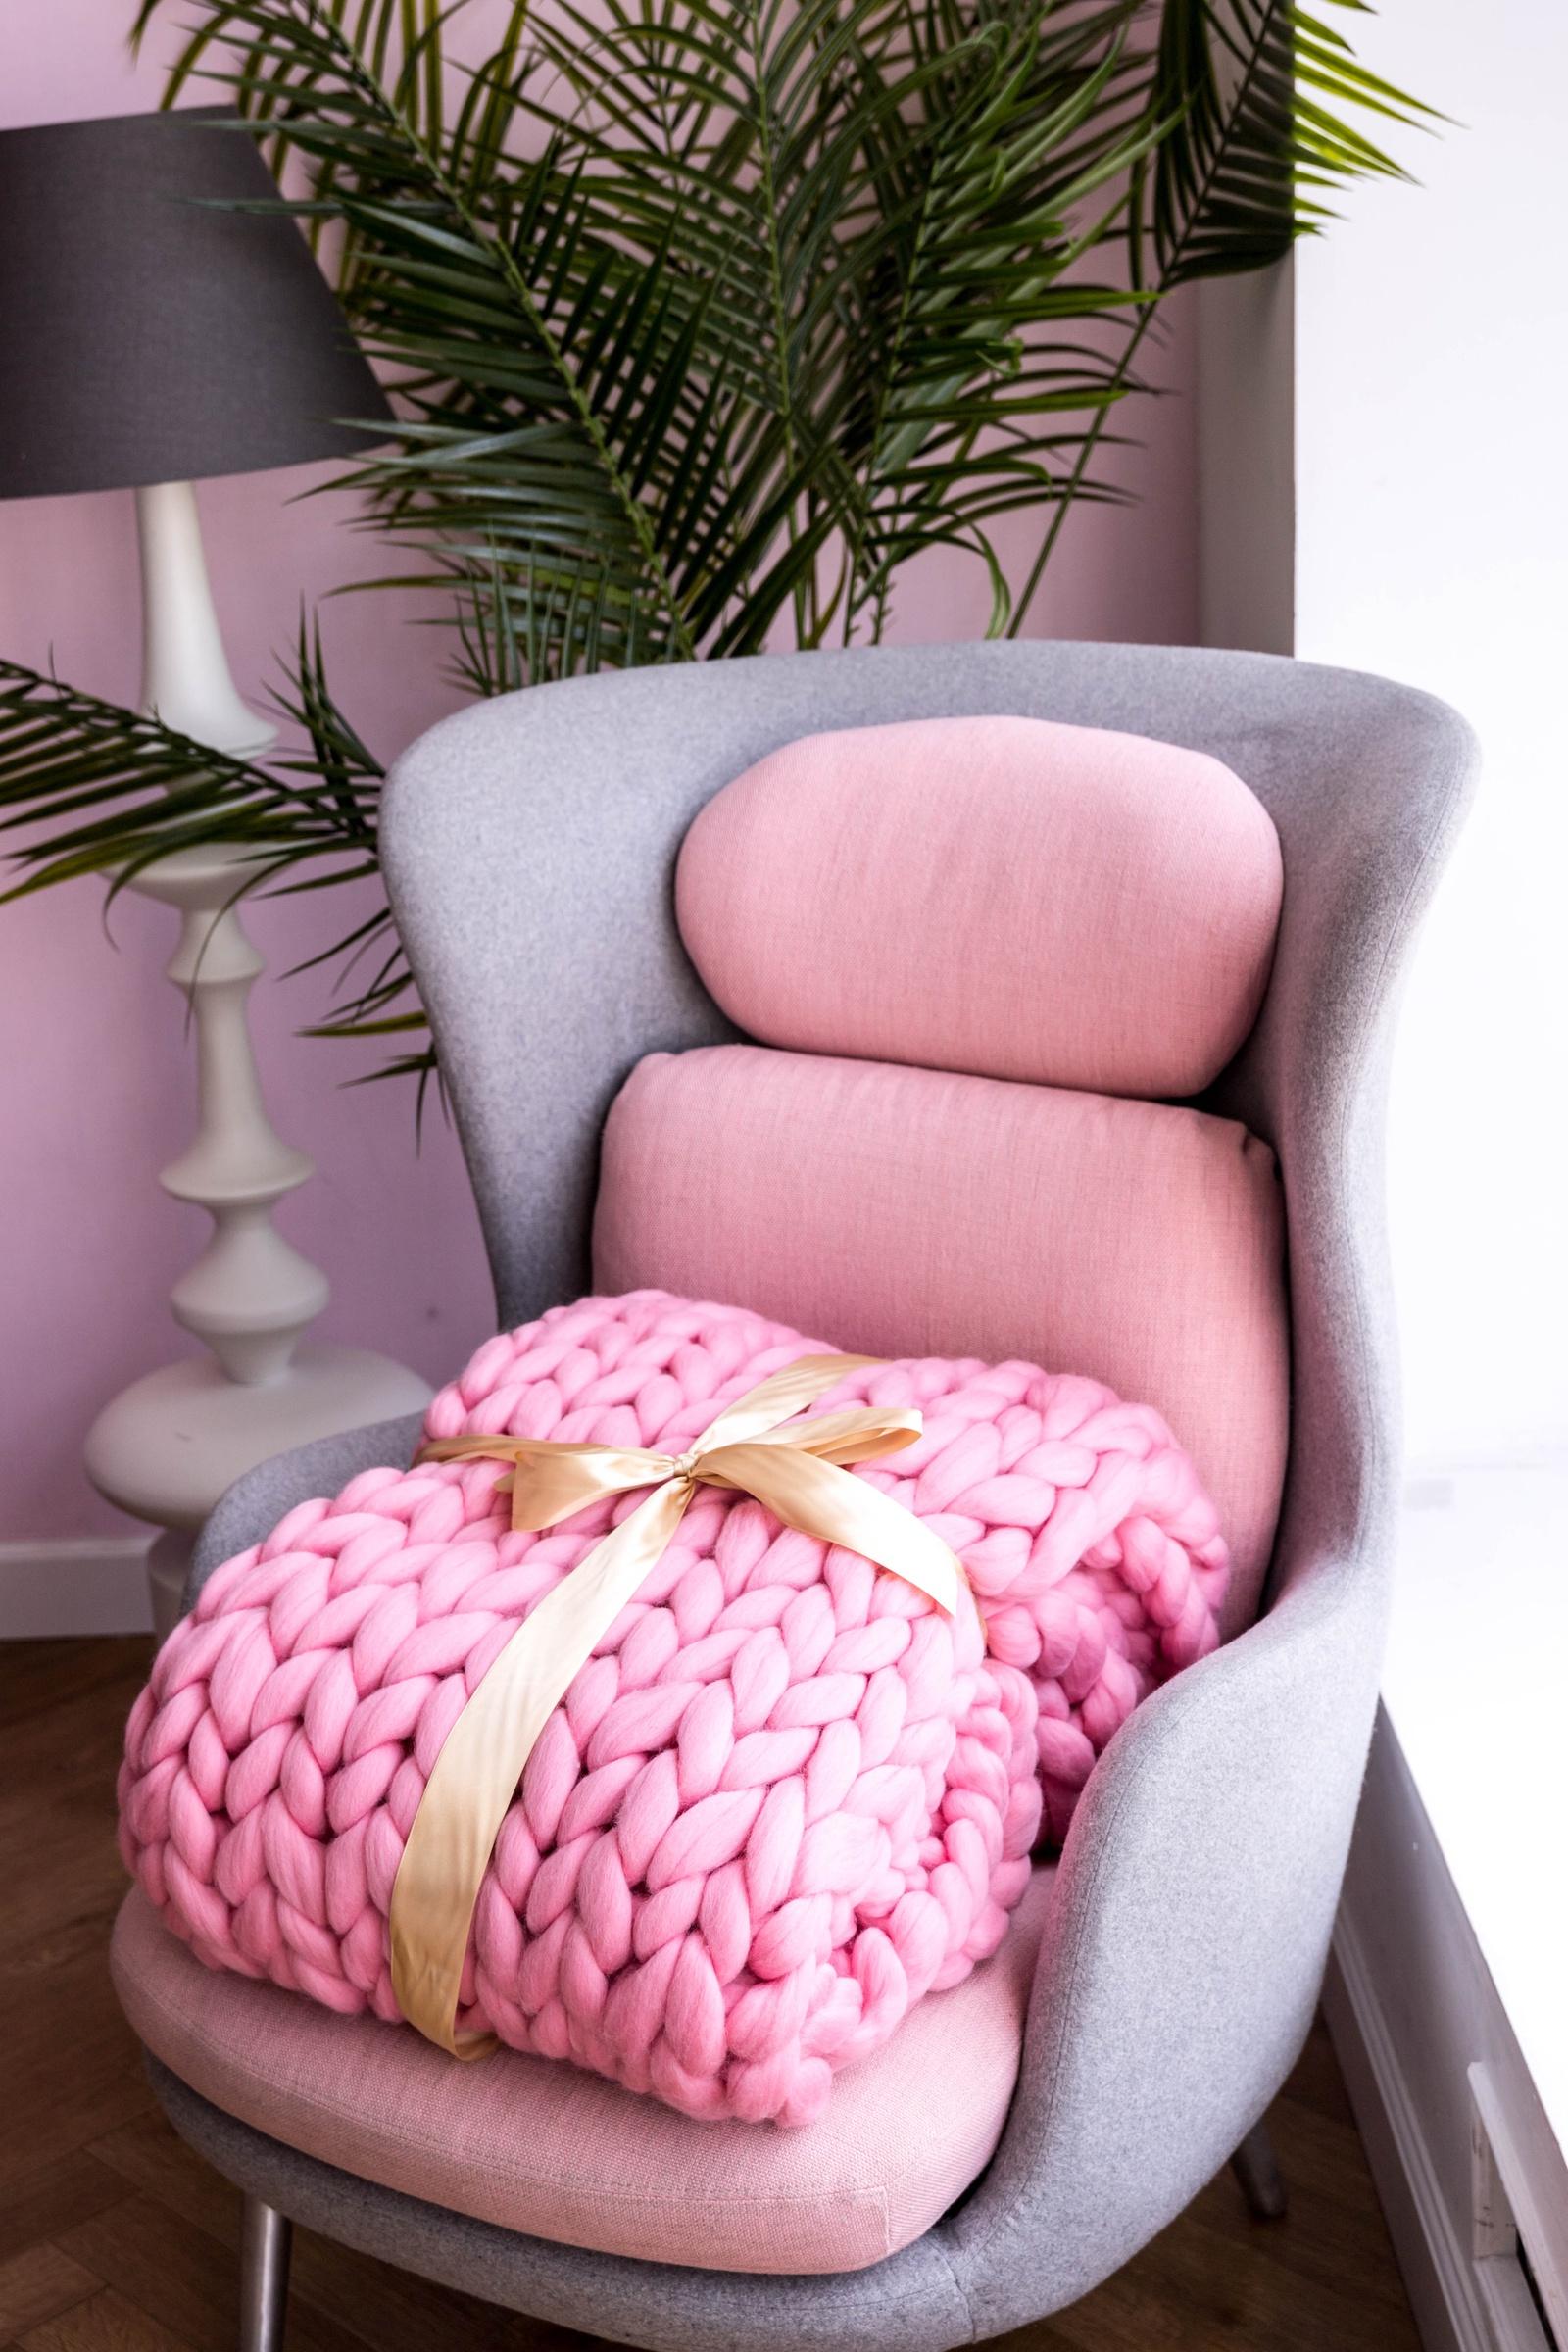 Плед Cloudlet, из гиперобъемной пряжи, цвет: светло-розовый плед cloudlet шерсть цвет светло розовый 100х150 см